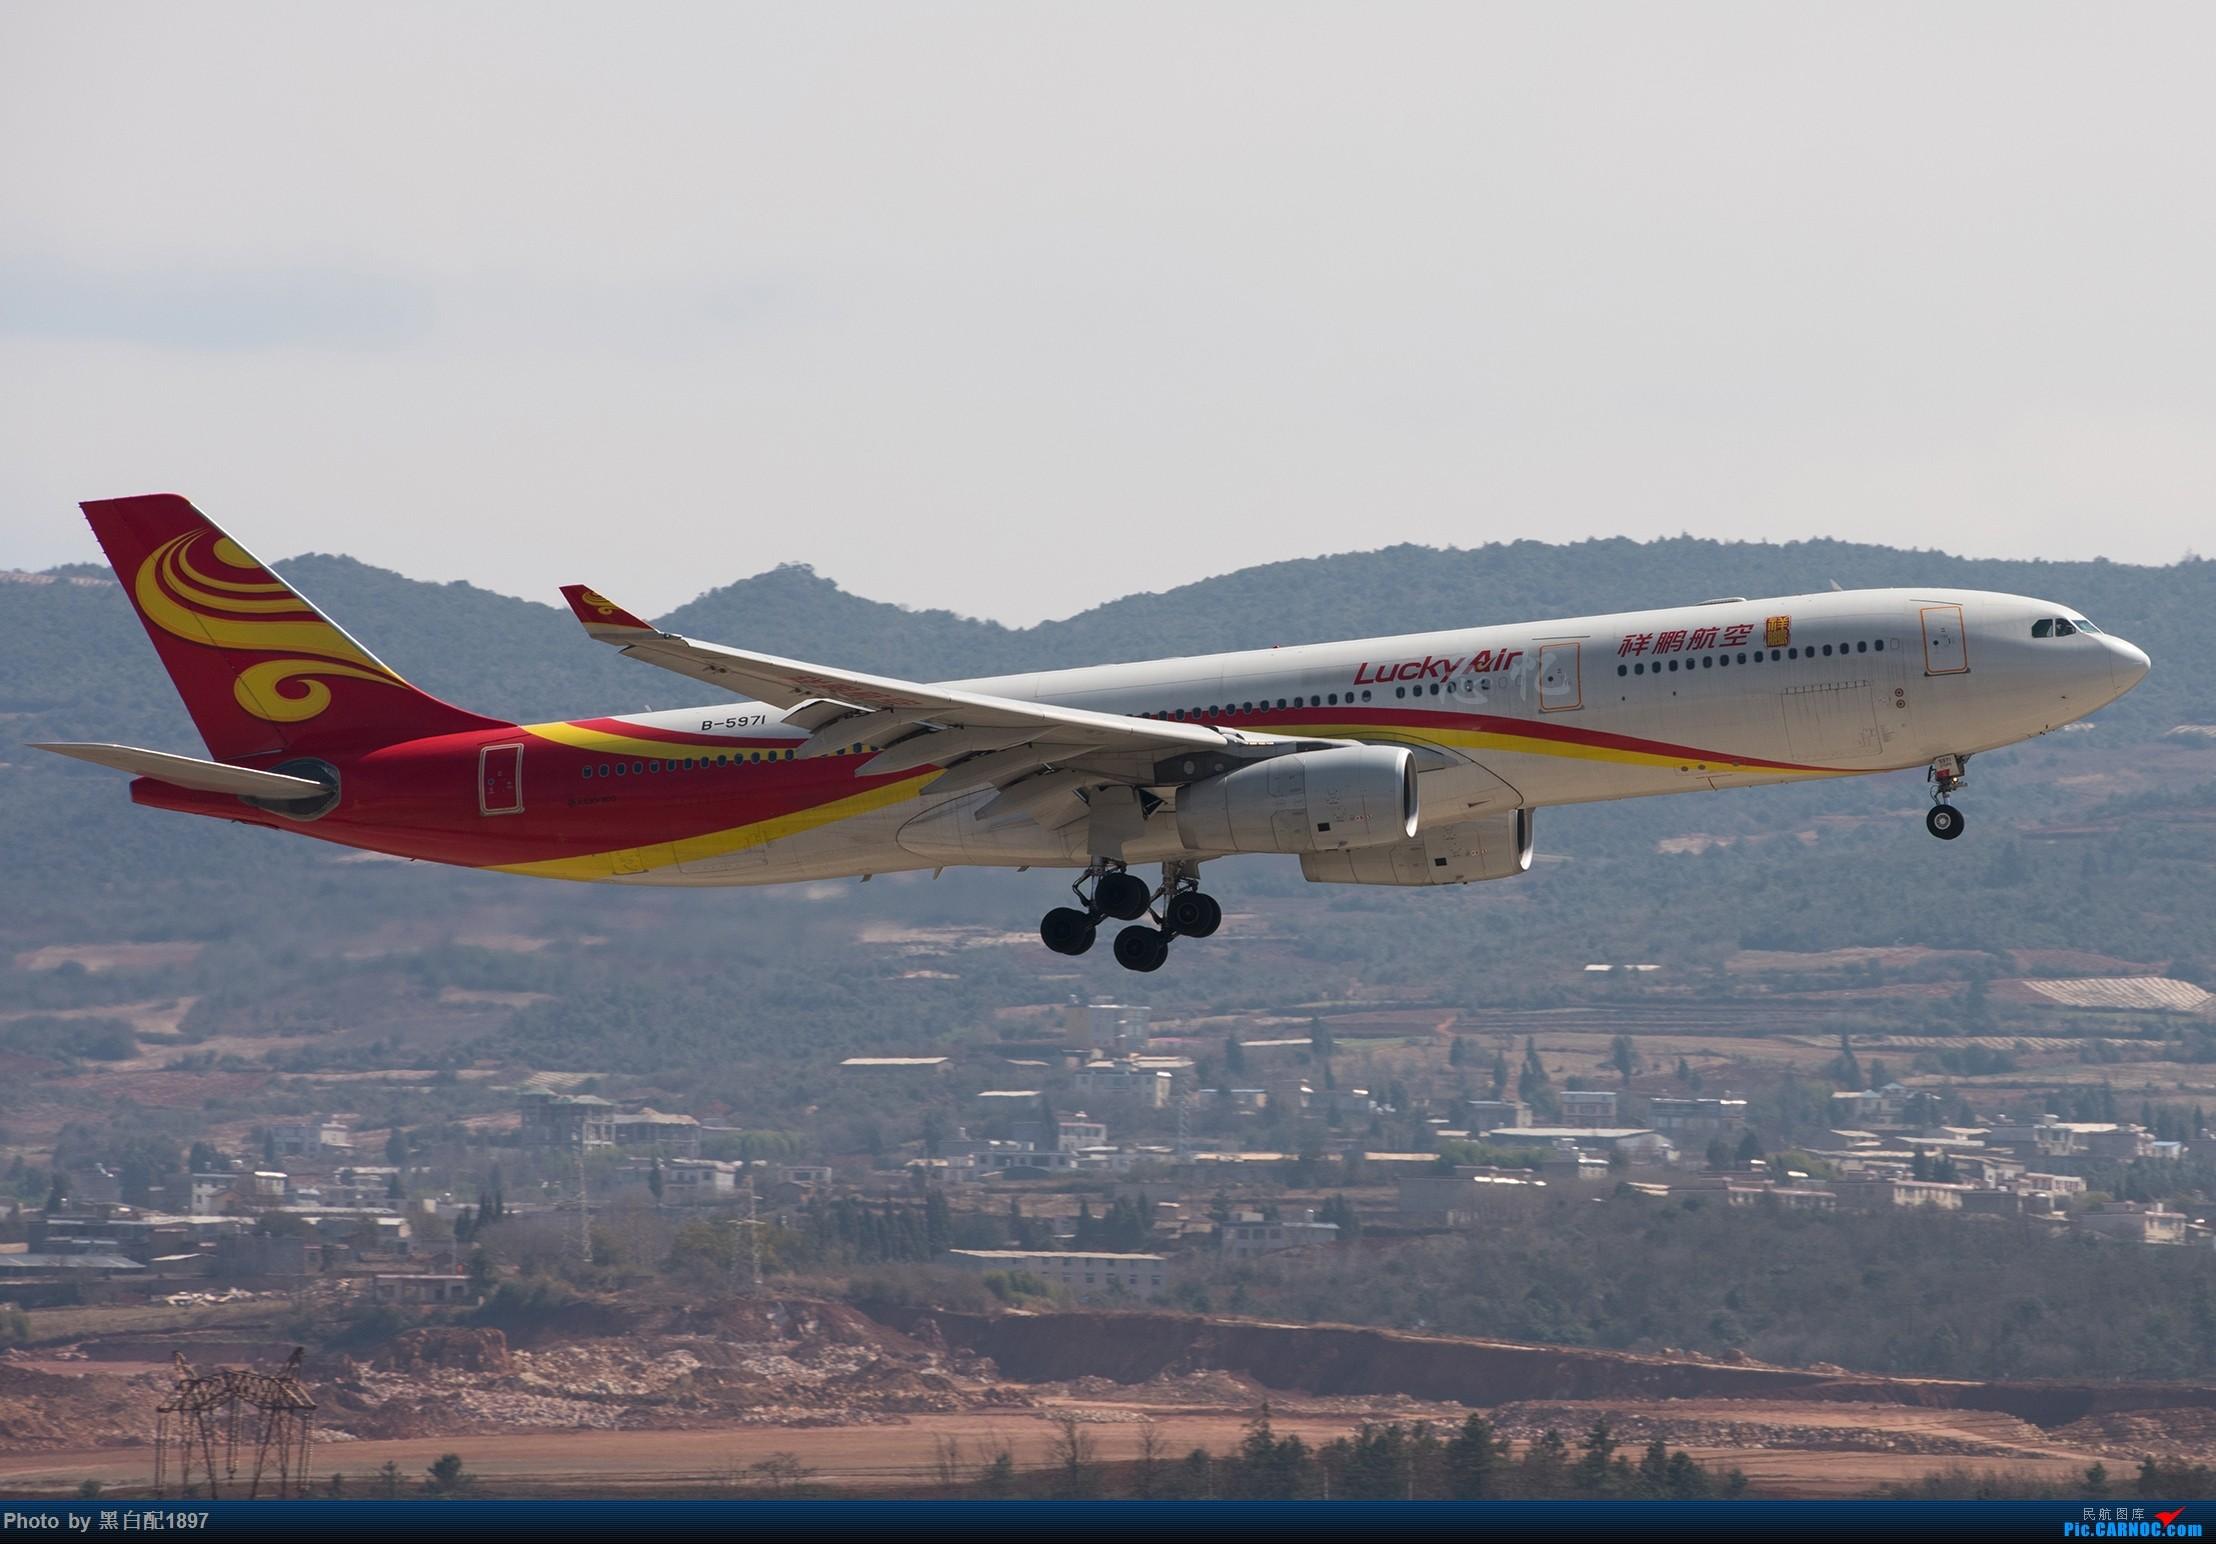 Re:鸡年收官图第二版 AIRBUS A330-300 B-5971 中国昆明长水国际机场